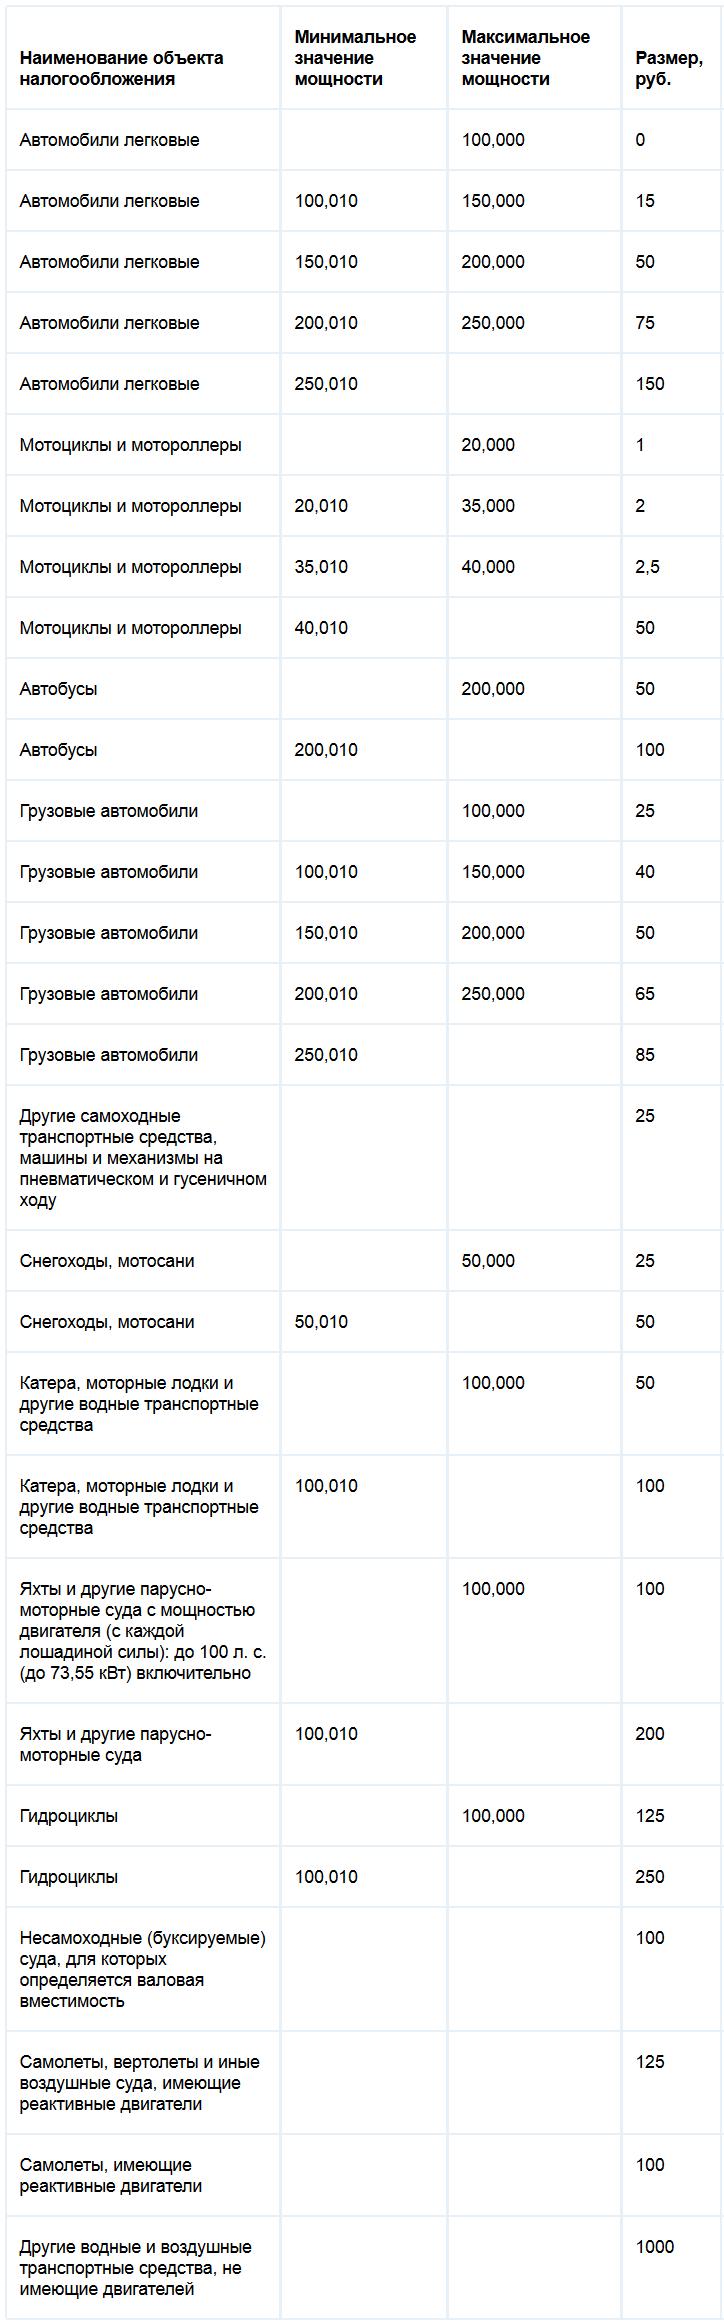 Ставки транспортного налога Оренбургской области